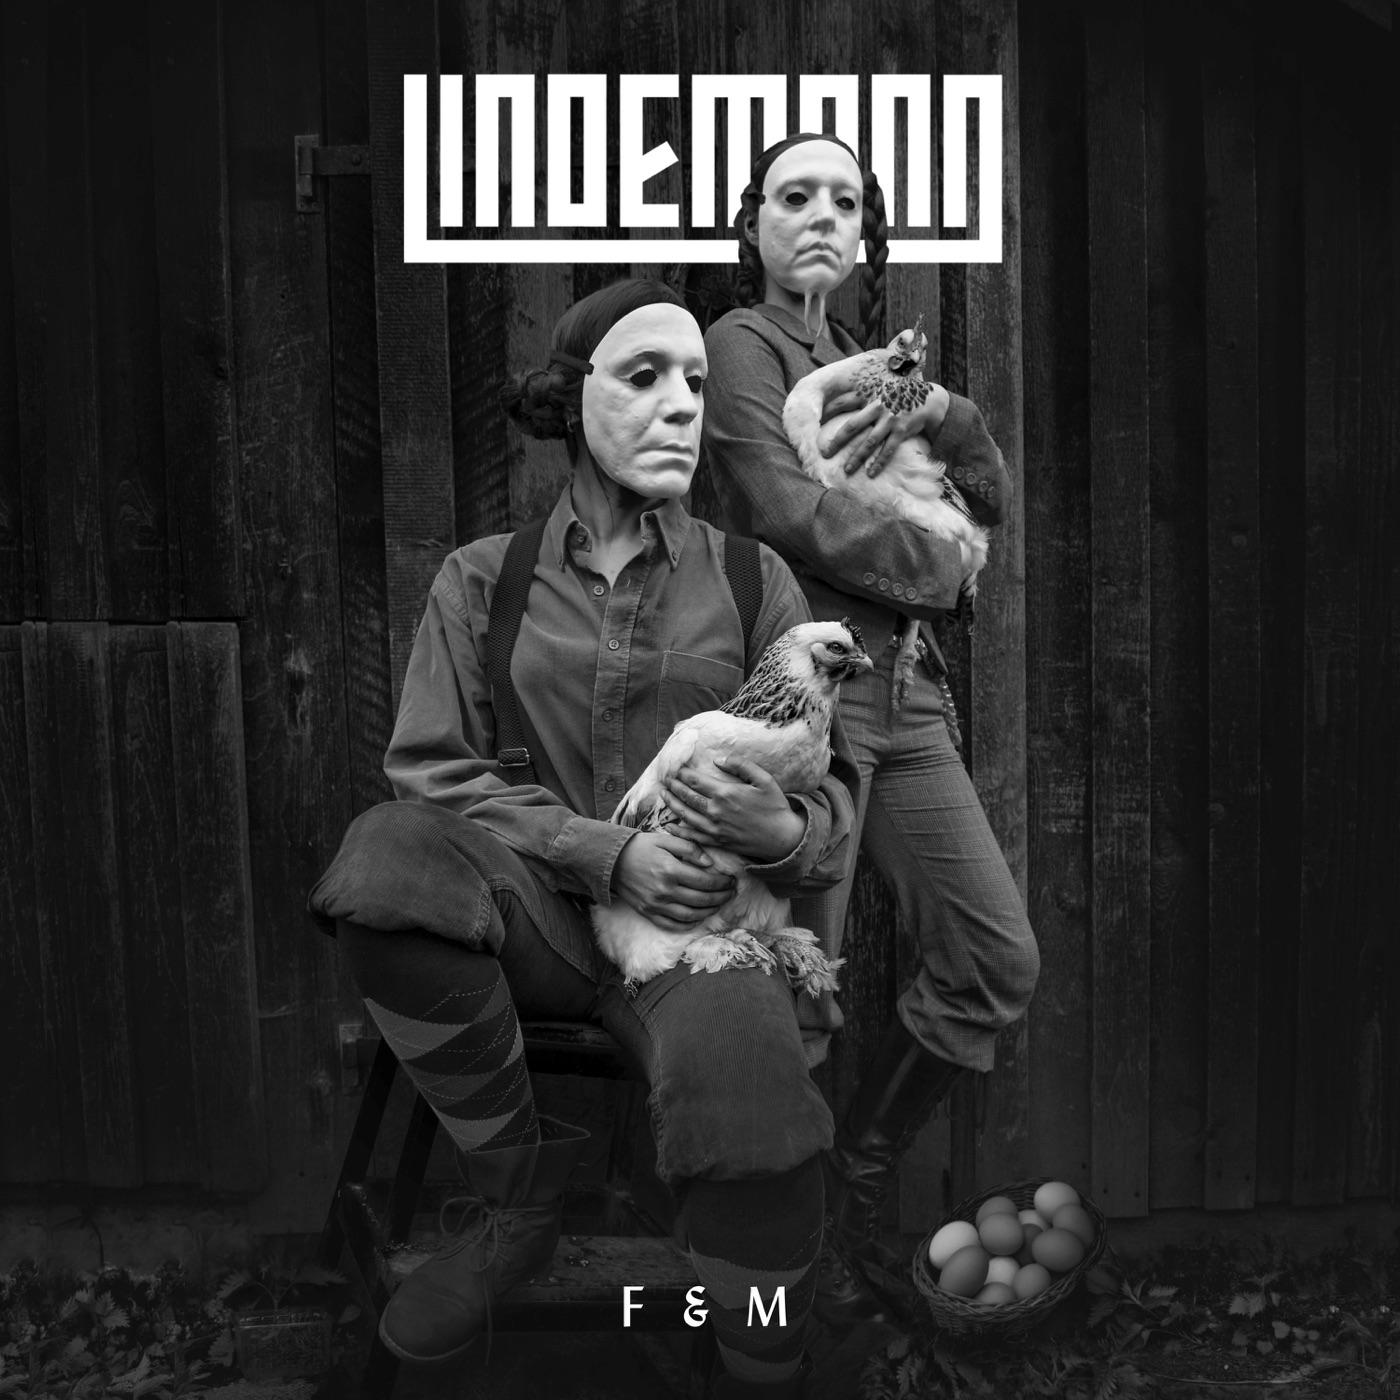 Lindemann - F & M (Deluxe) (2019)